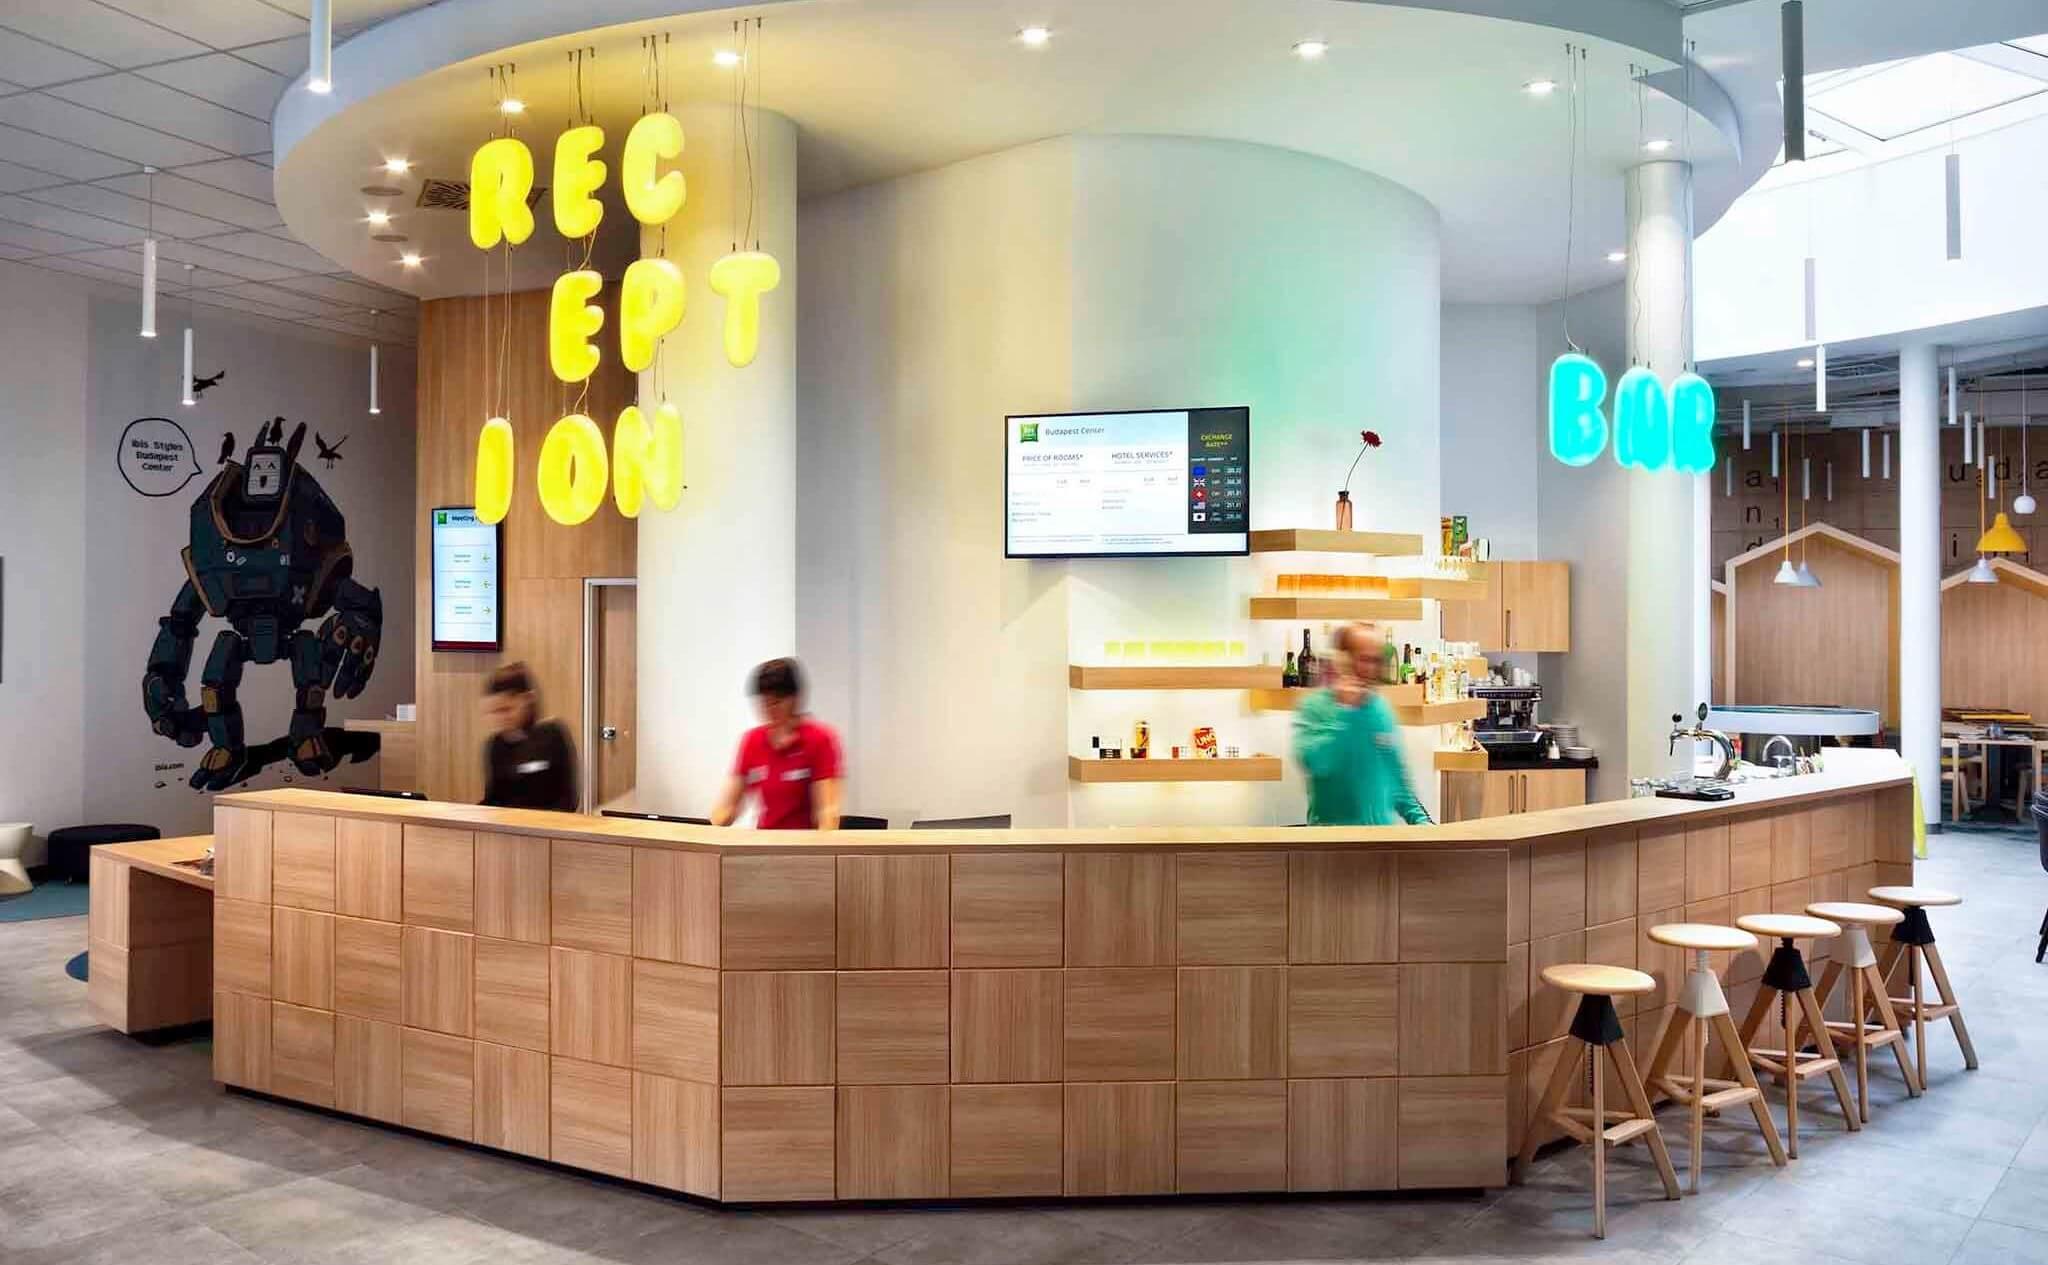 ibis styles budapest center מלונות 3 כוכבים בבודפשט